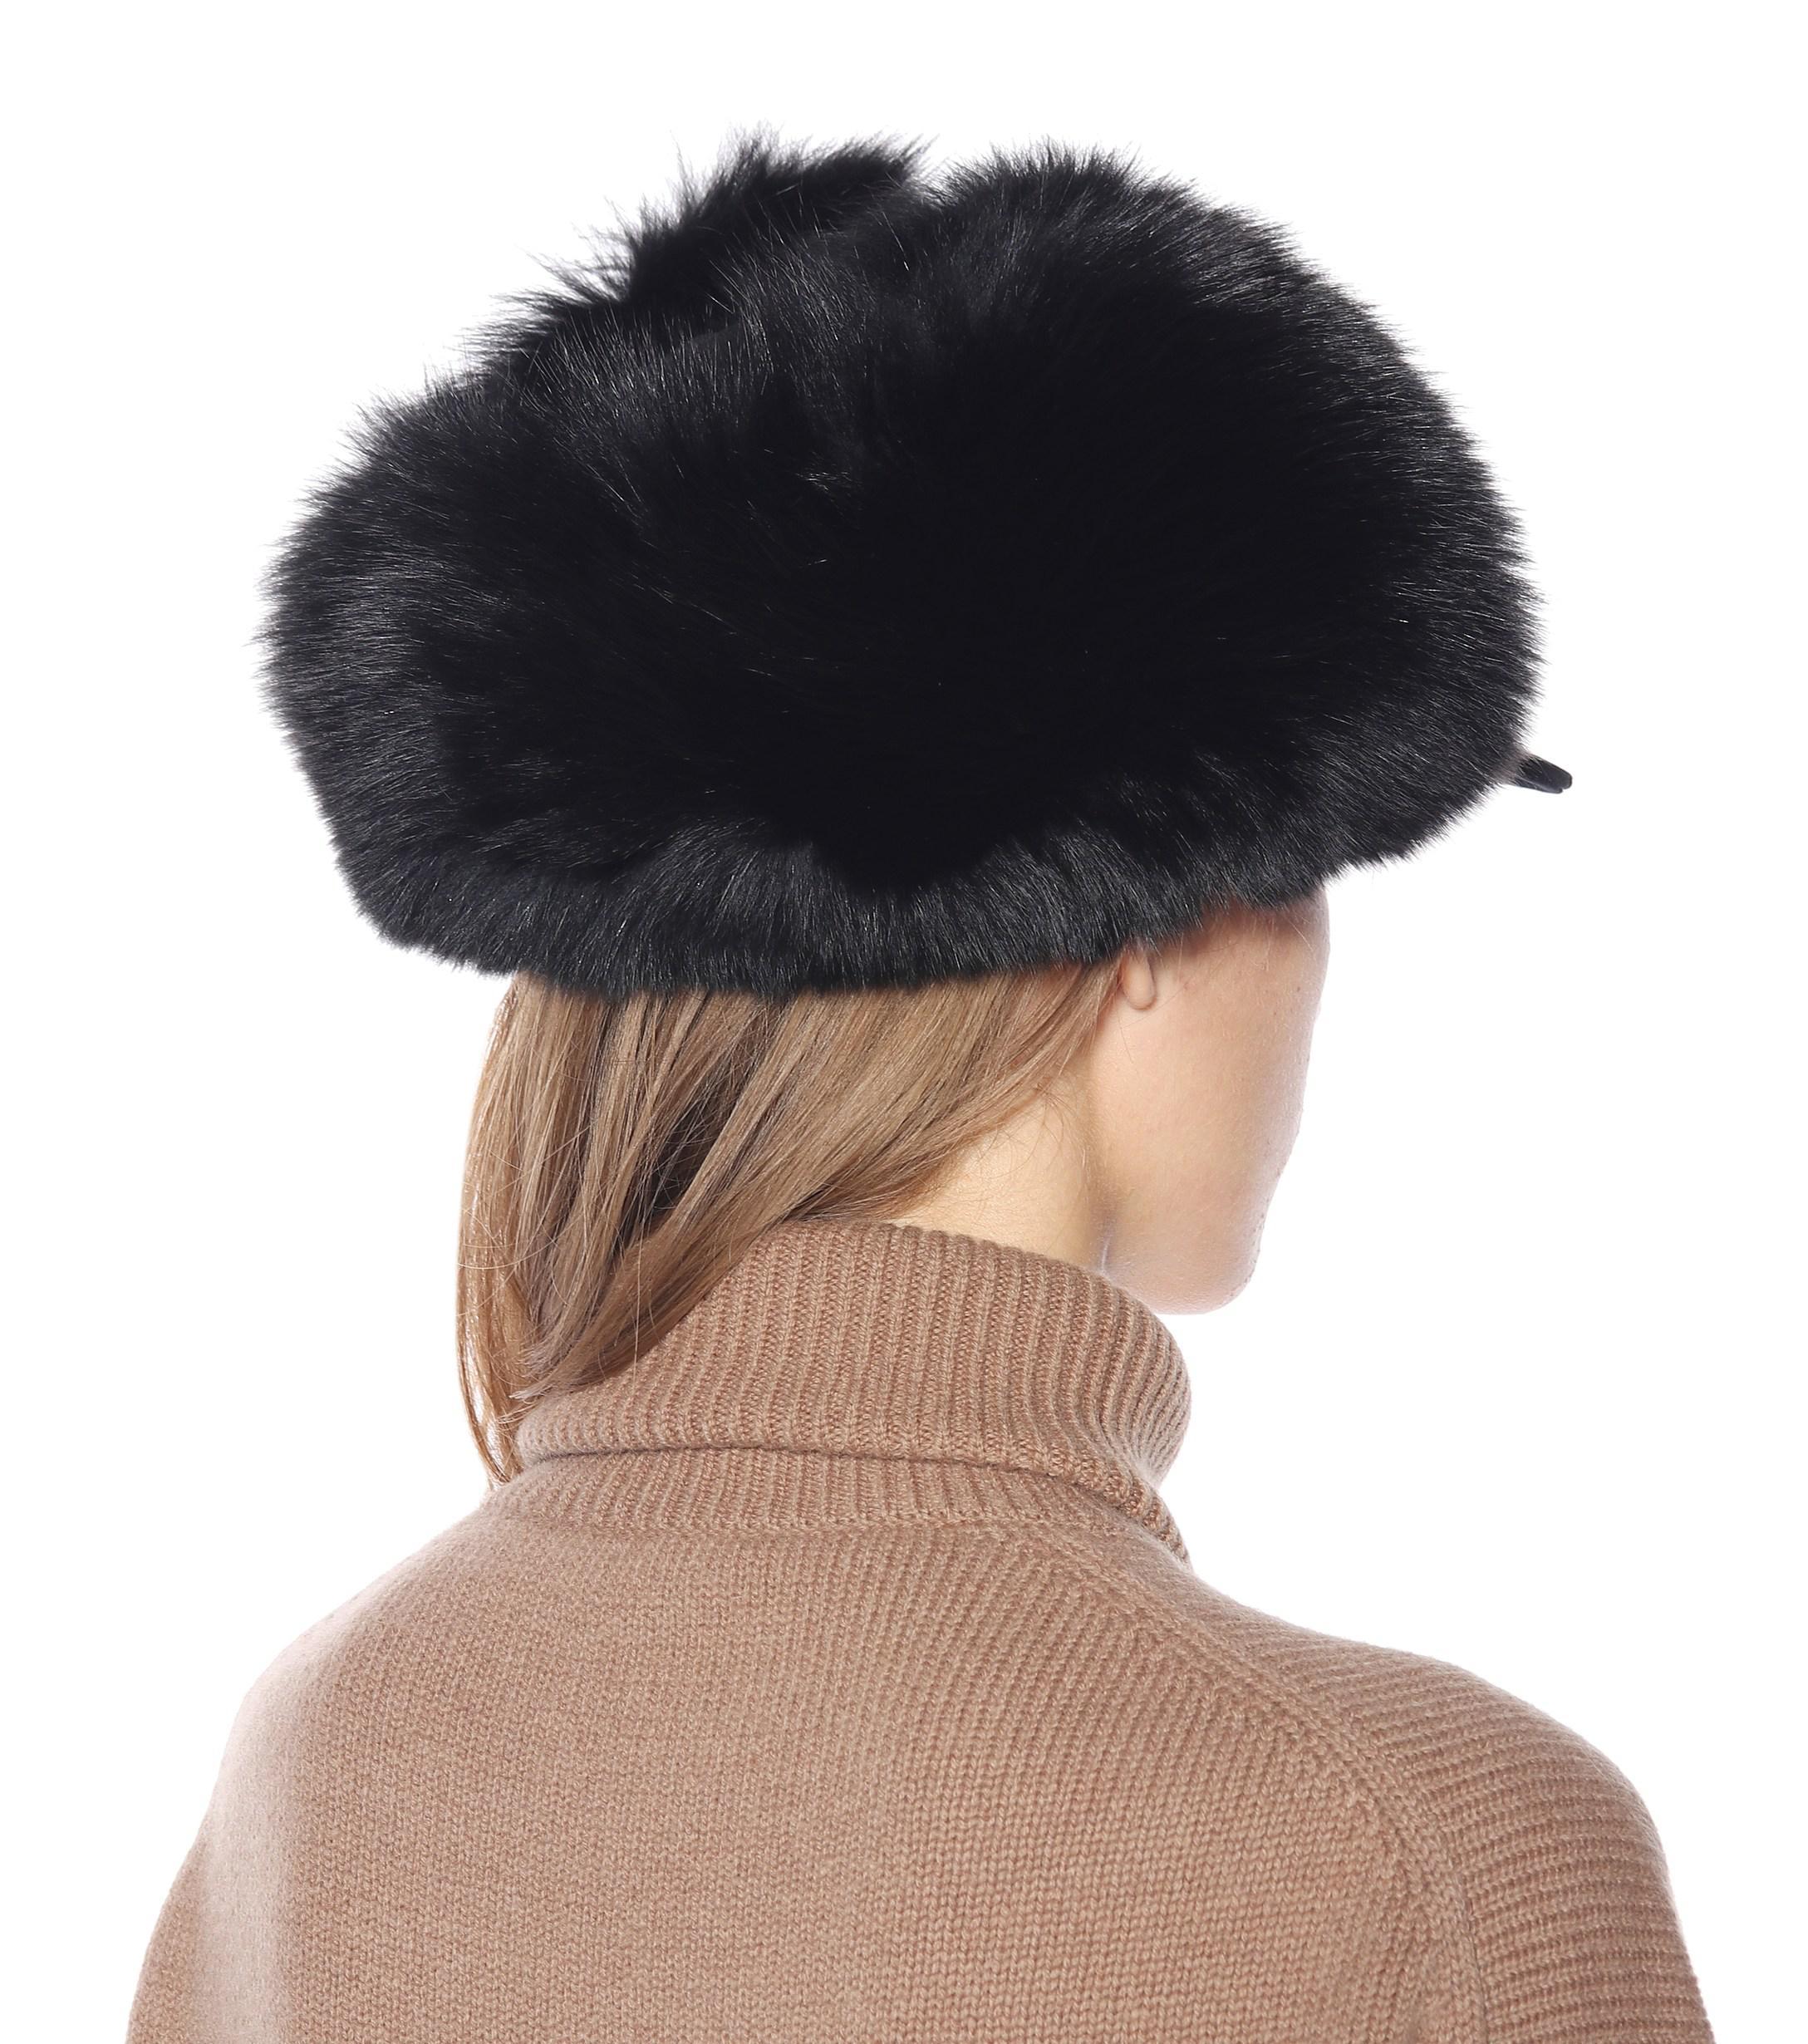 073dcd2c15b Moncler - Black Fur-lined Cotton Trapper Hat - Lyst. View fullscreen